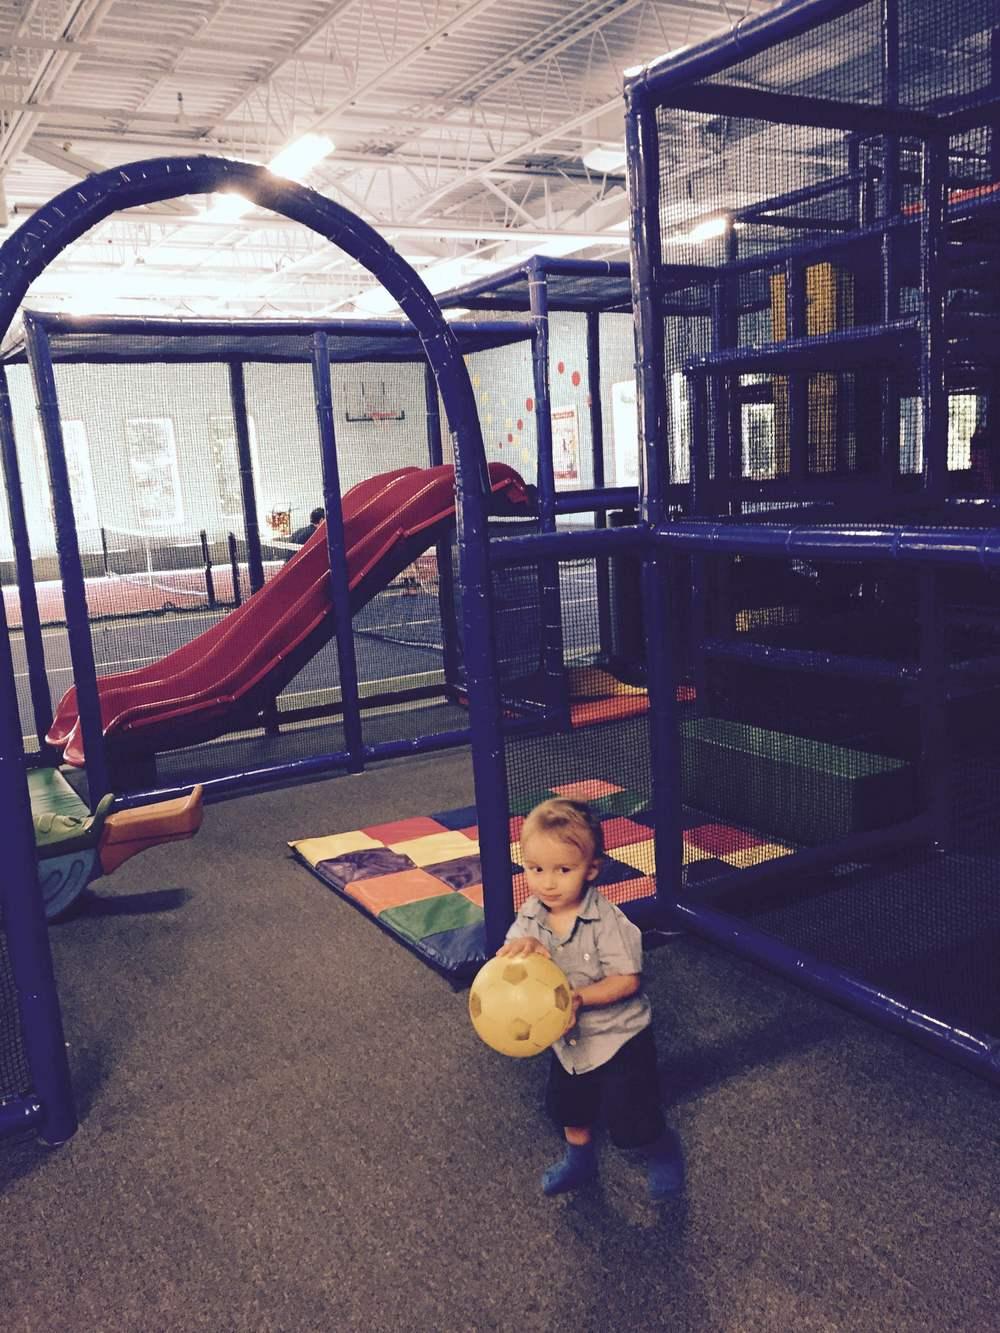 The Indoor Playground